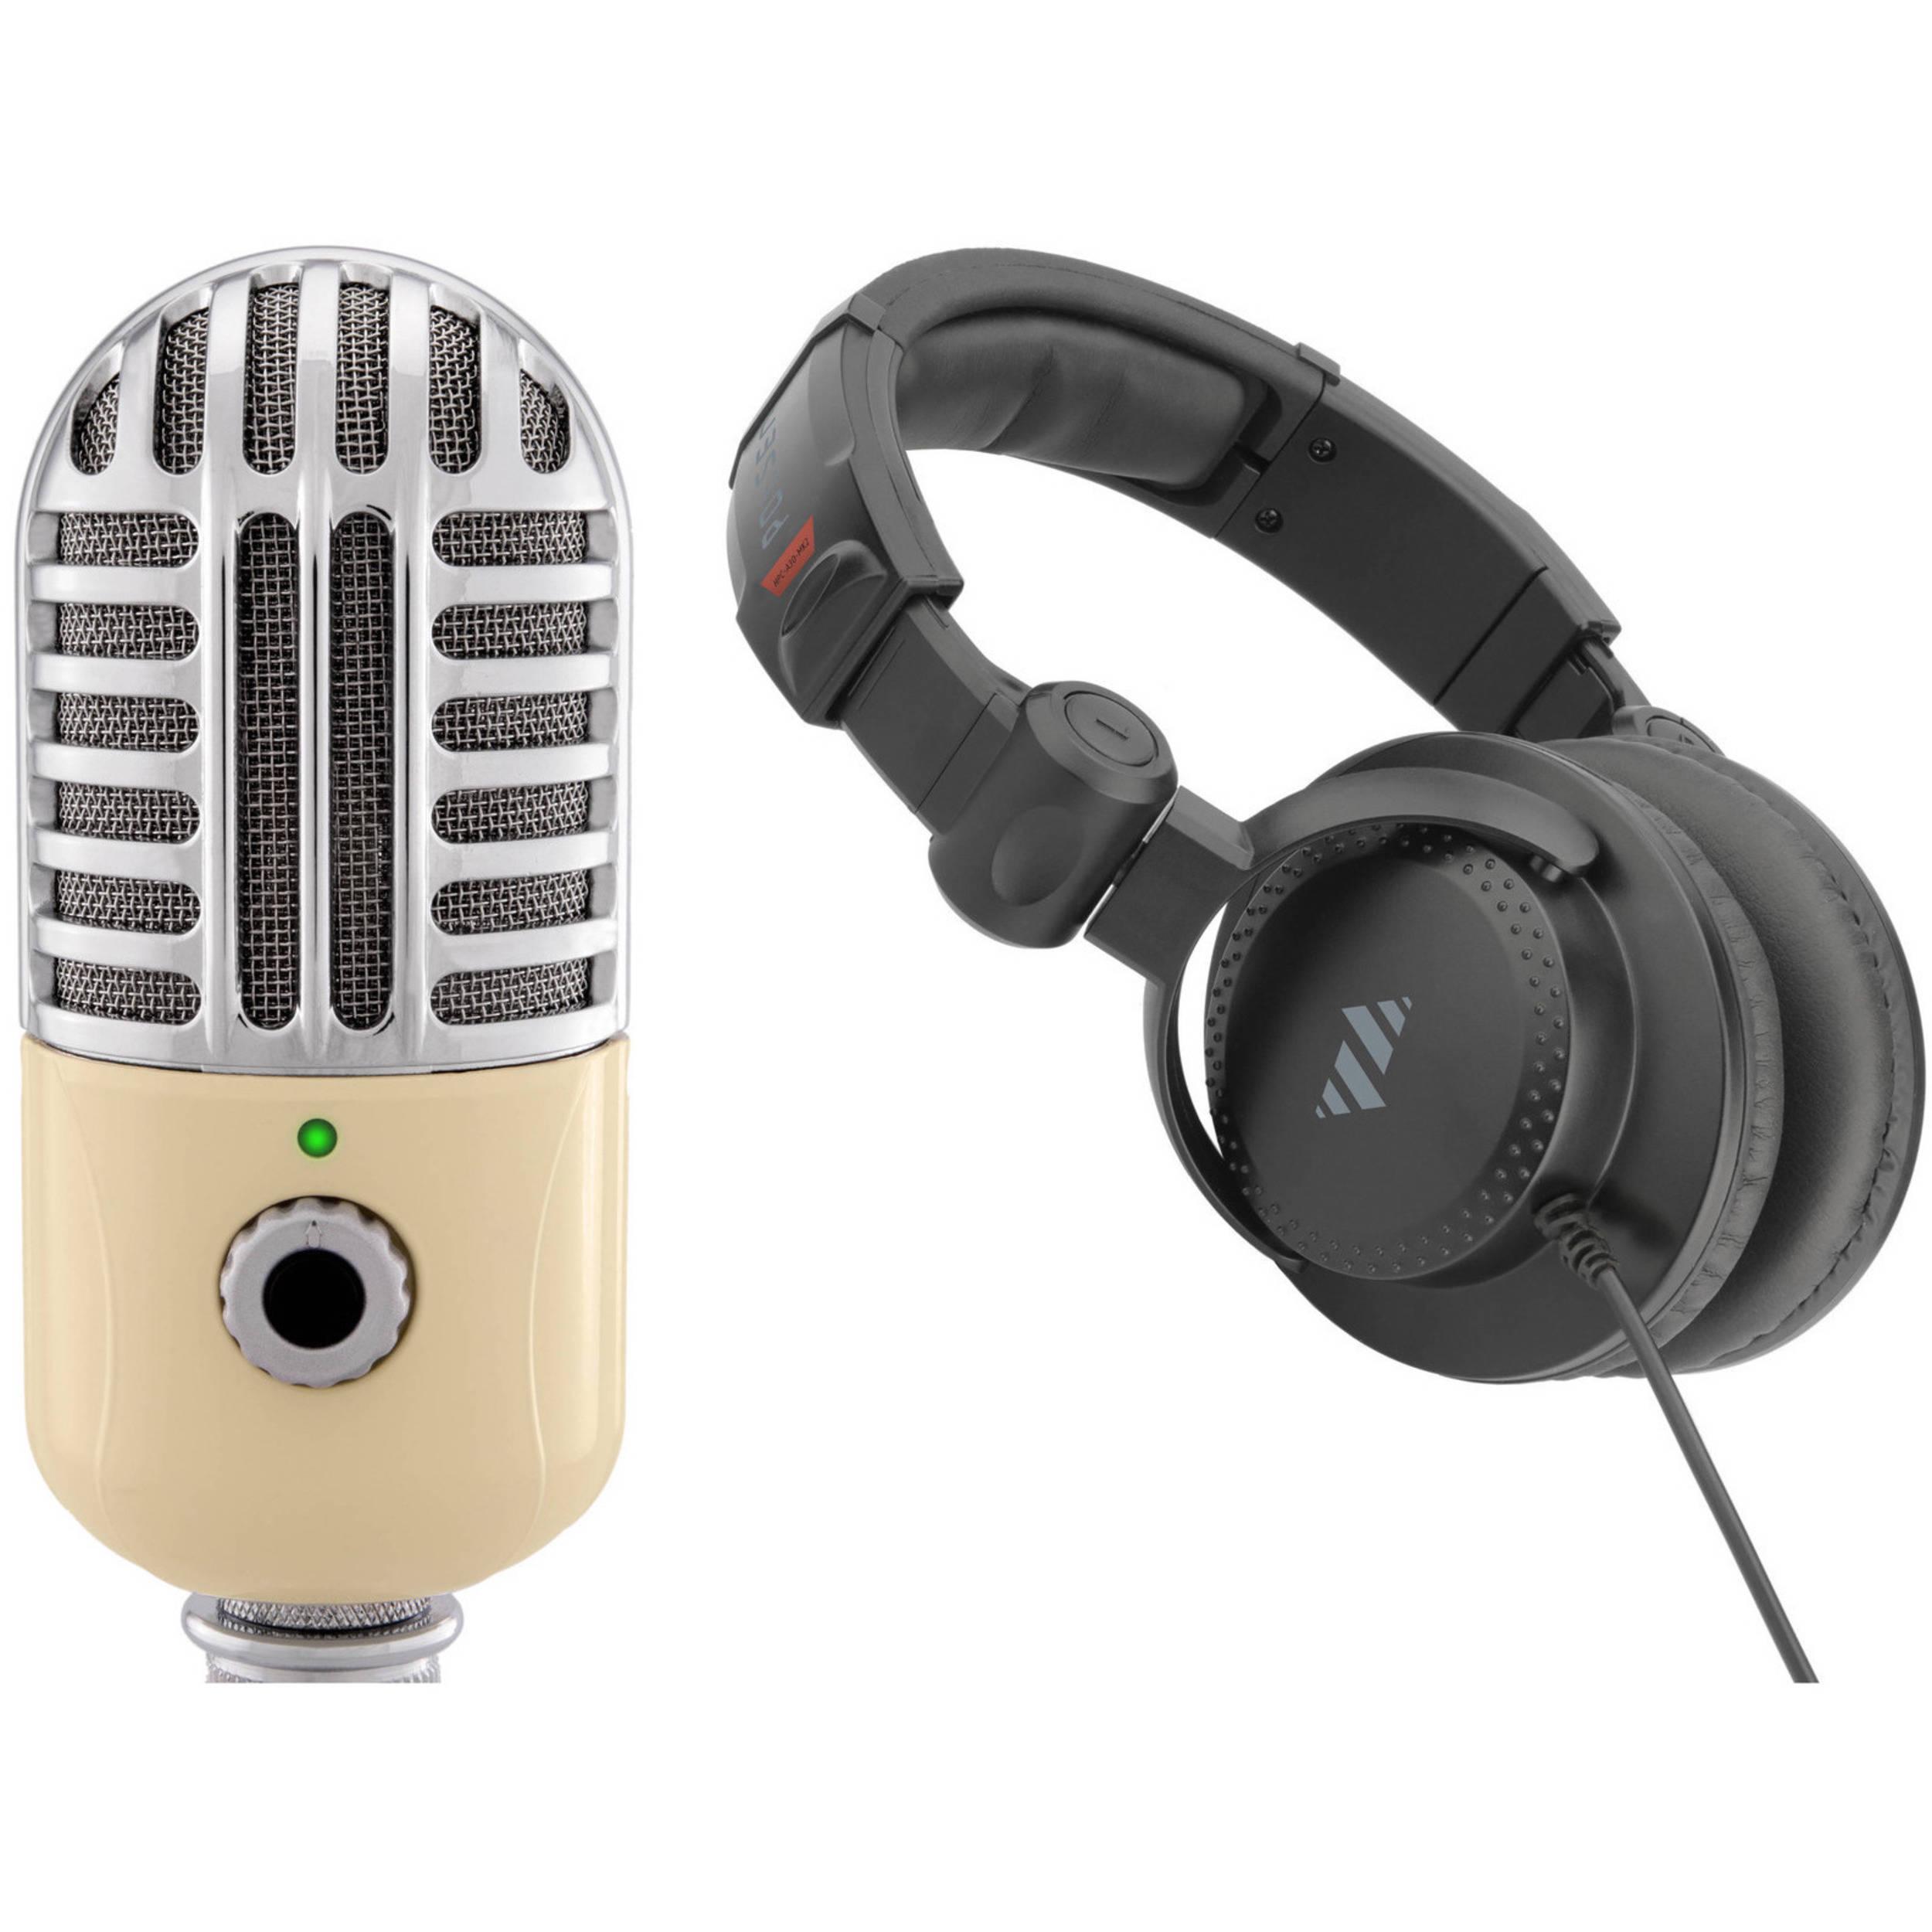 polsen usb mic with desktop reflection filter and mic stand kit. Black Bedroom Furniture Sets. Home Design Ideas